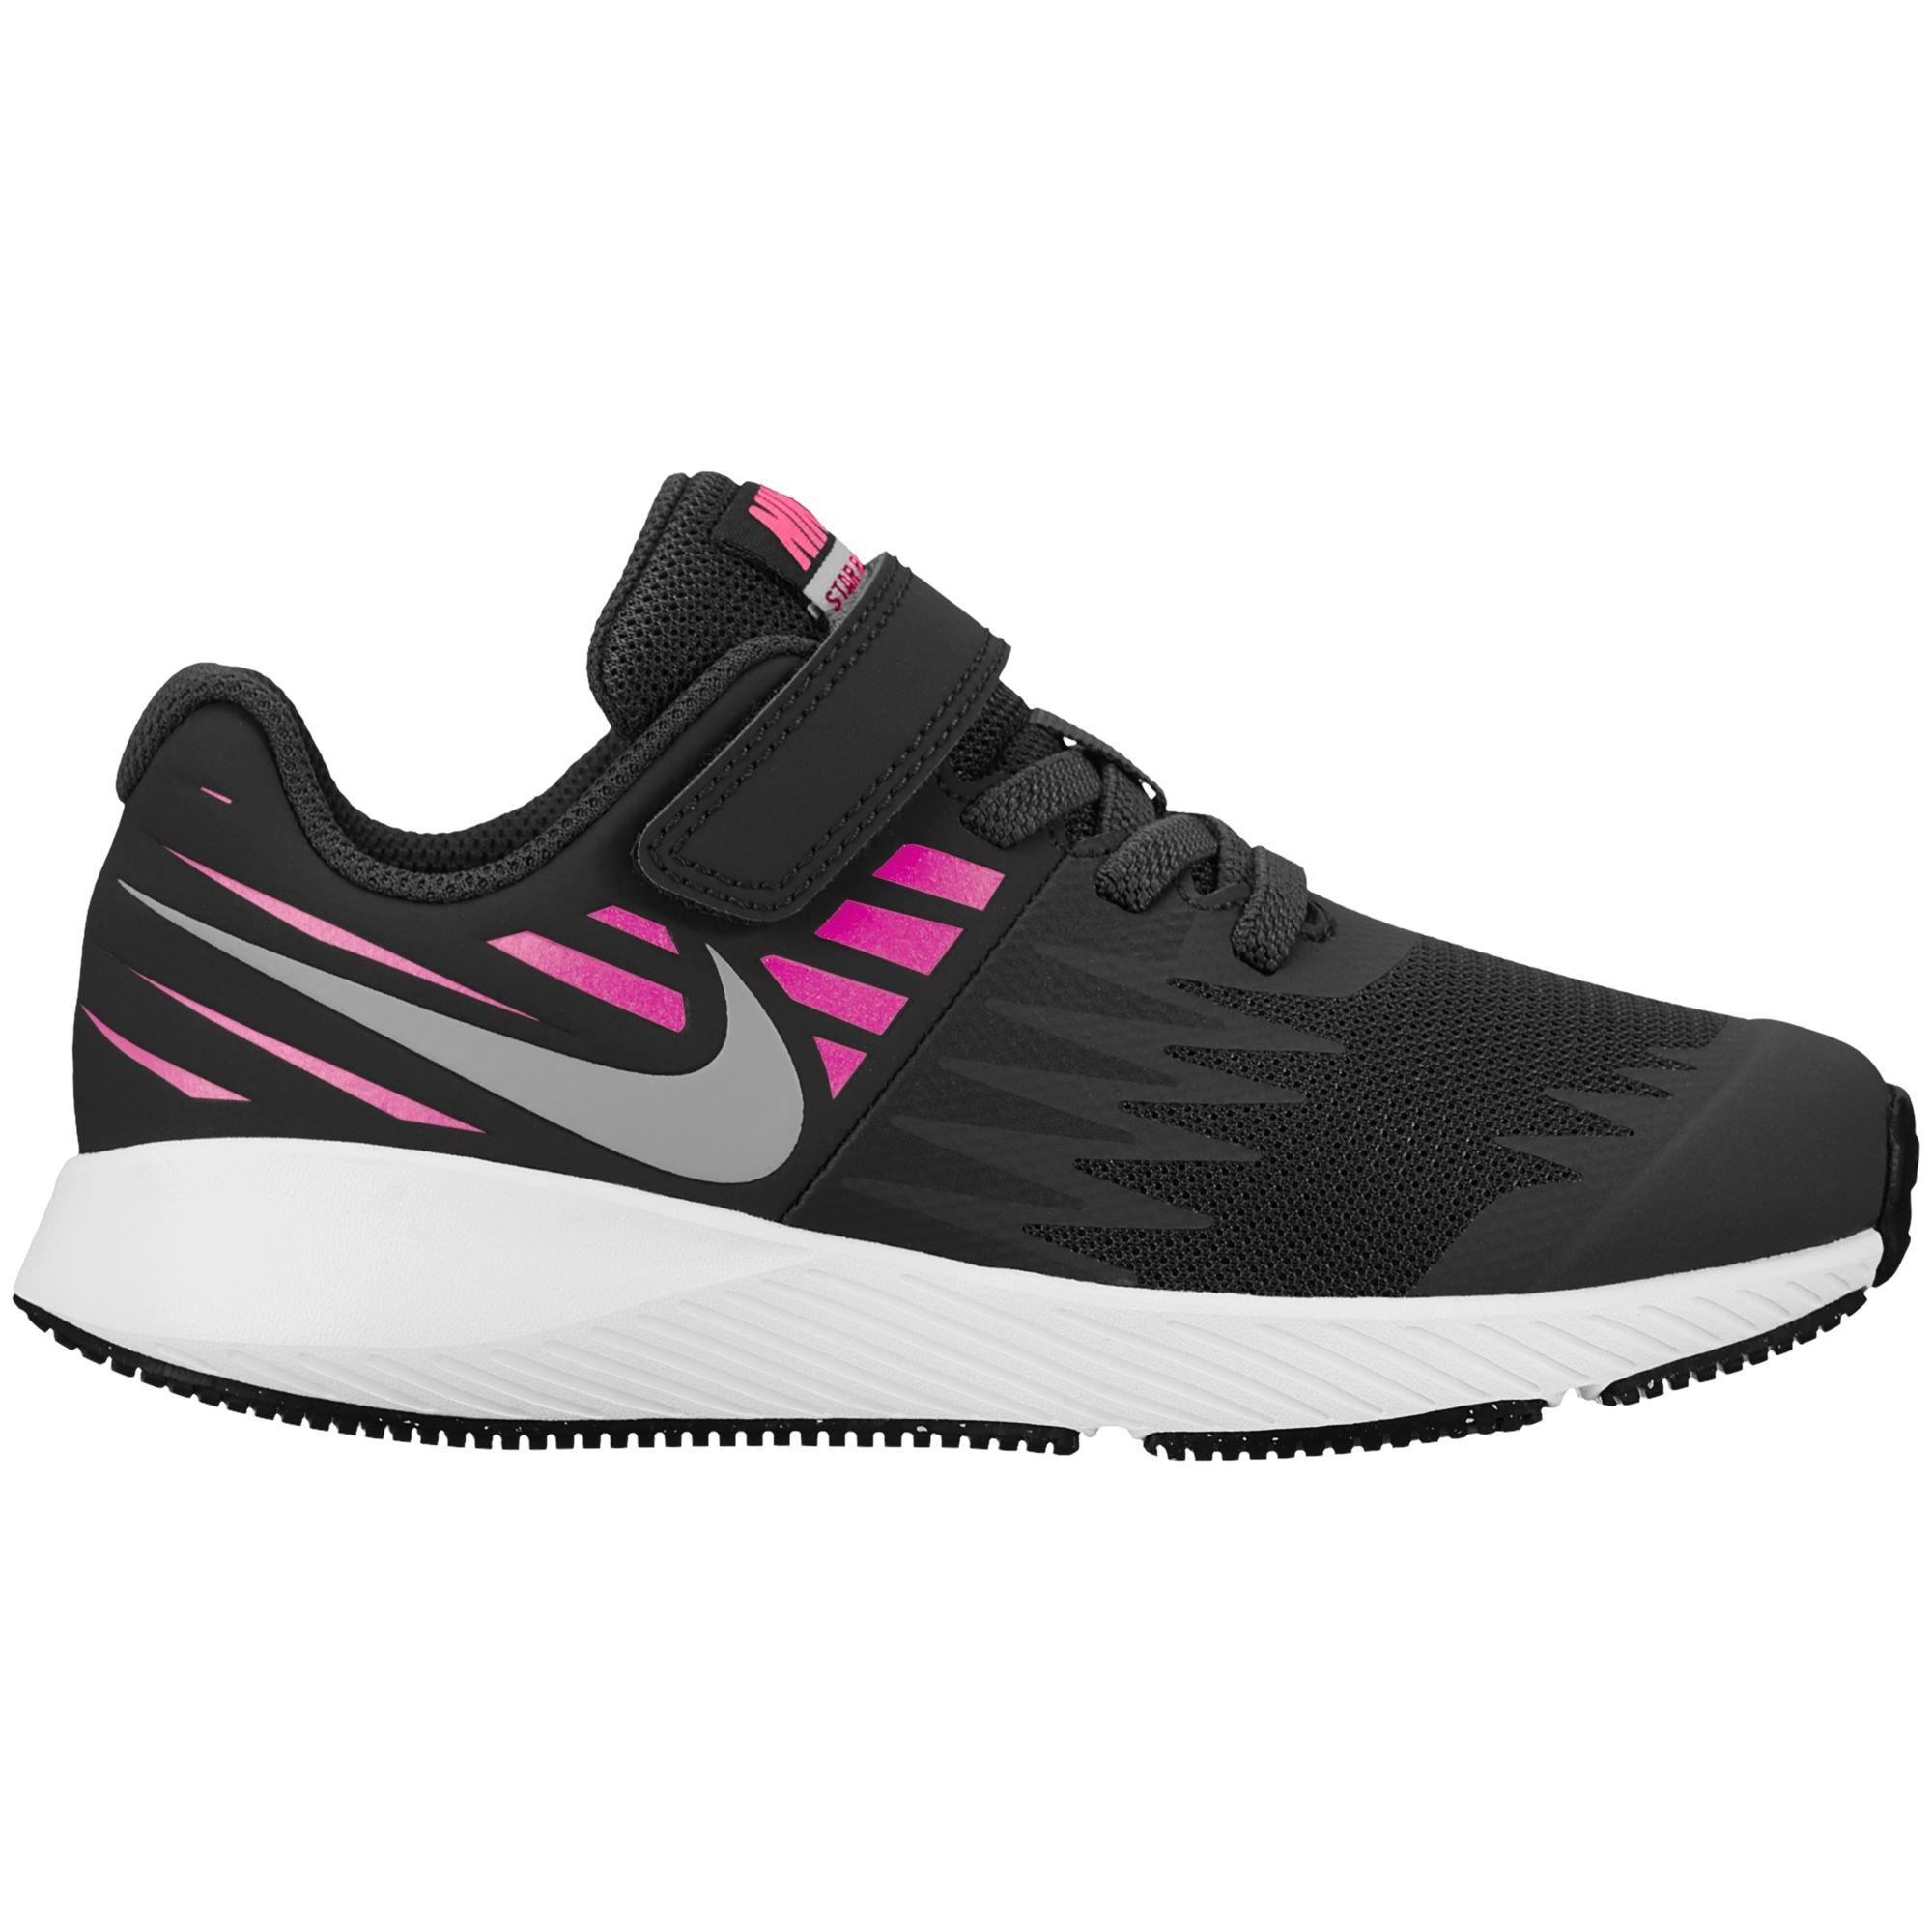 Nike Girl's Star Runner (PSV) Pre-School Shoe Black/Metallic Silver/Racer Pink/Volt Size 2 M US